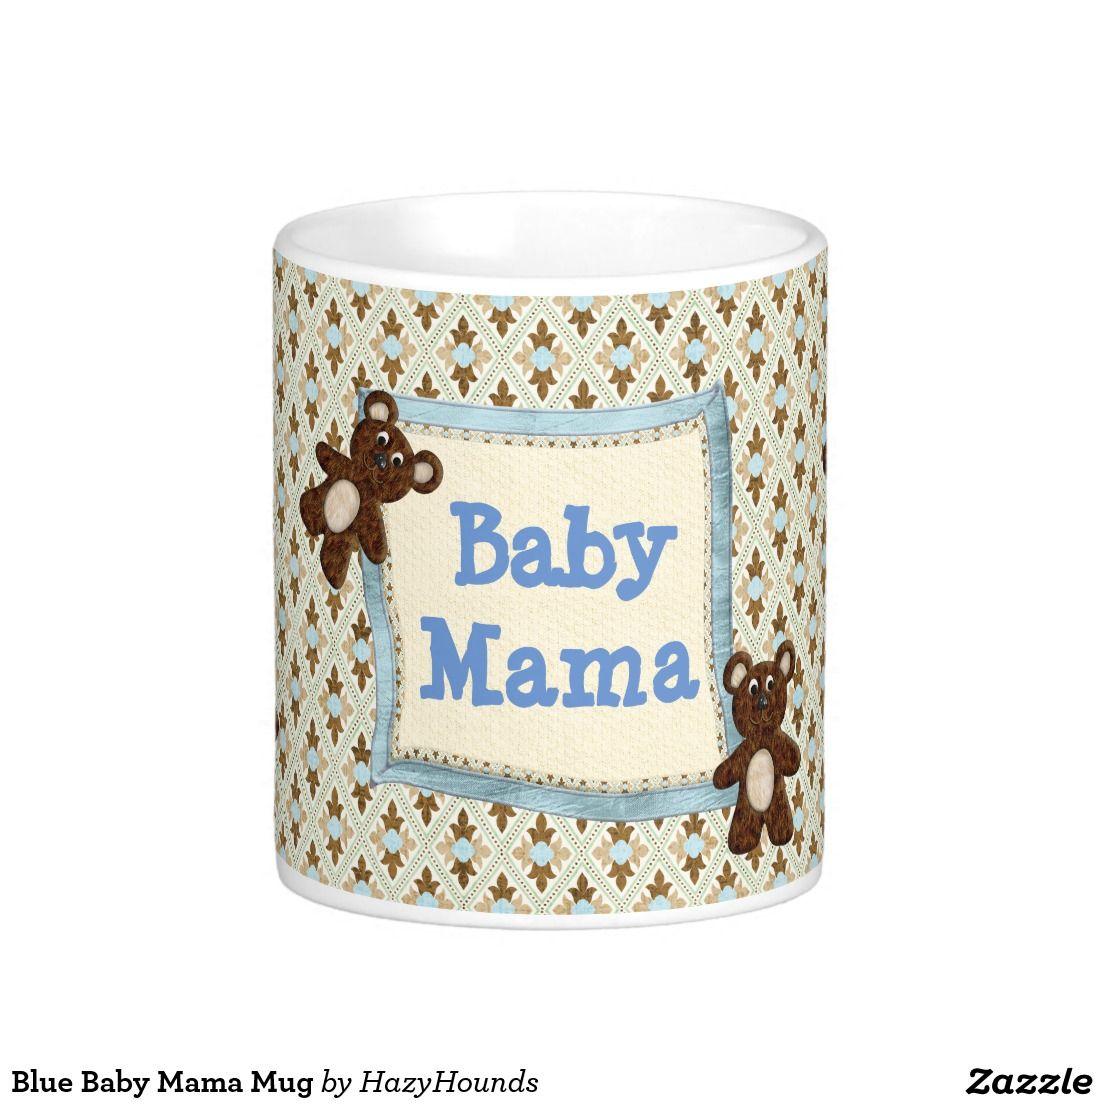 Blue Baby Mama Mug